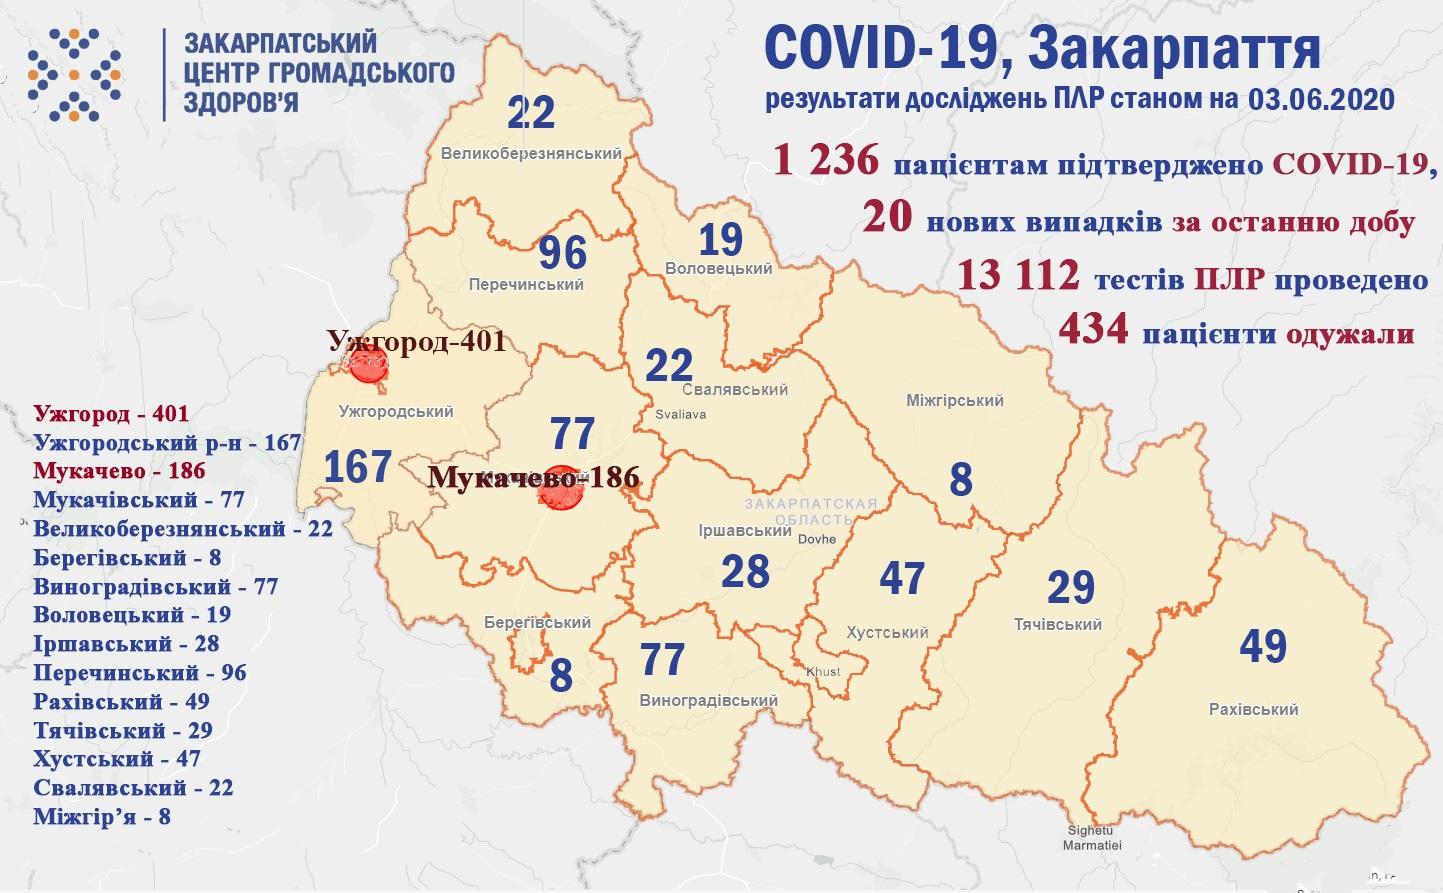 Загалом у Закарпатській області 1236 пацієнтам підтверджено COVID-19